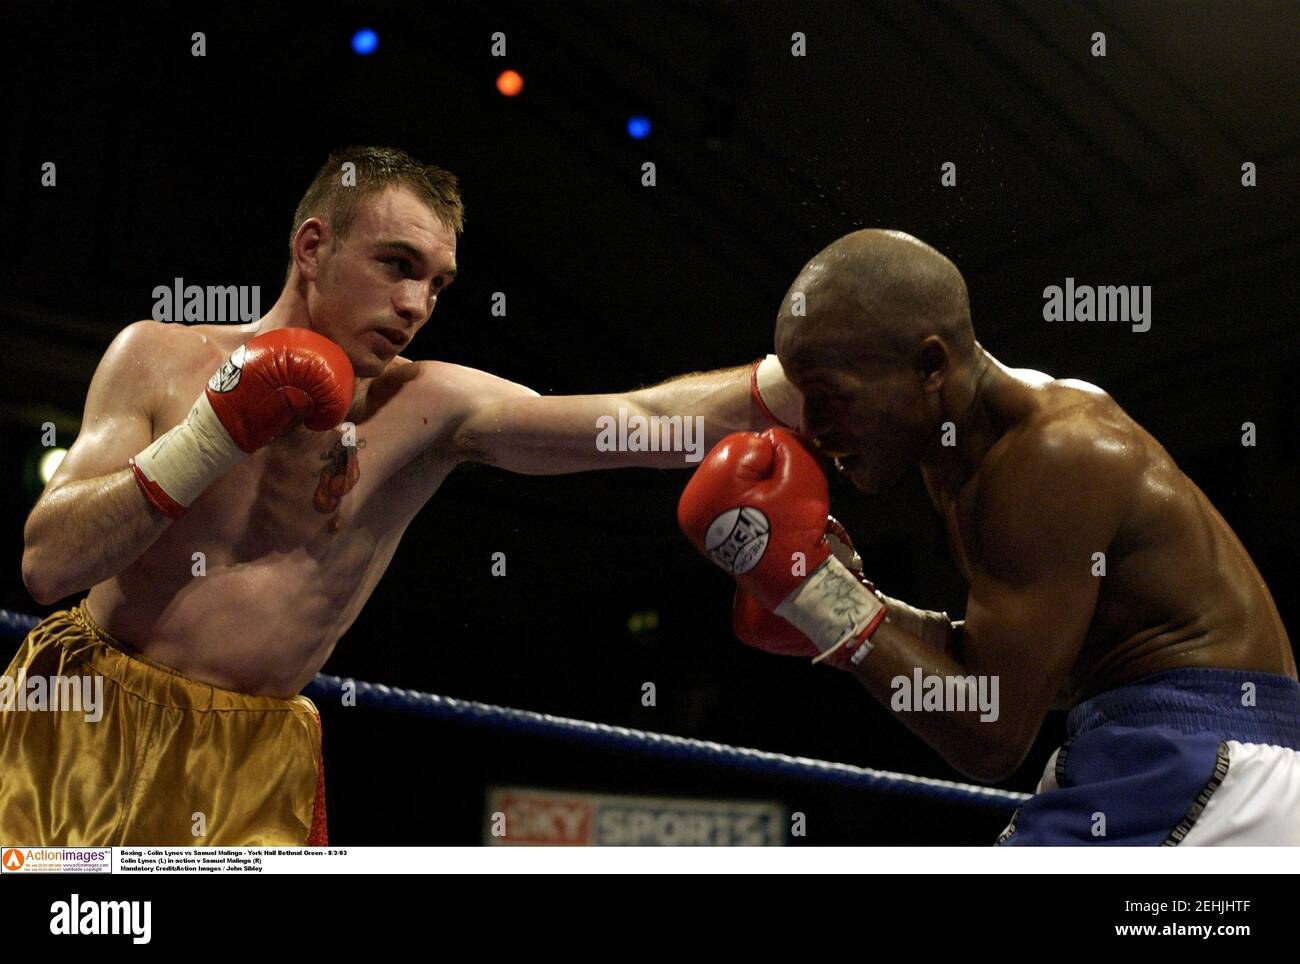 Boxeo - Colin Lynes vs Samuel Malinga - York Hall Bethenal Green - 8/3/03 Colin Lynes (L) en acción v Samuel Malinga (R) crédito obligatorio:Imágenes de acción / John Sibley Foto de stock